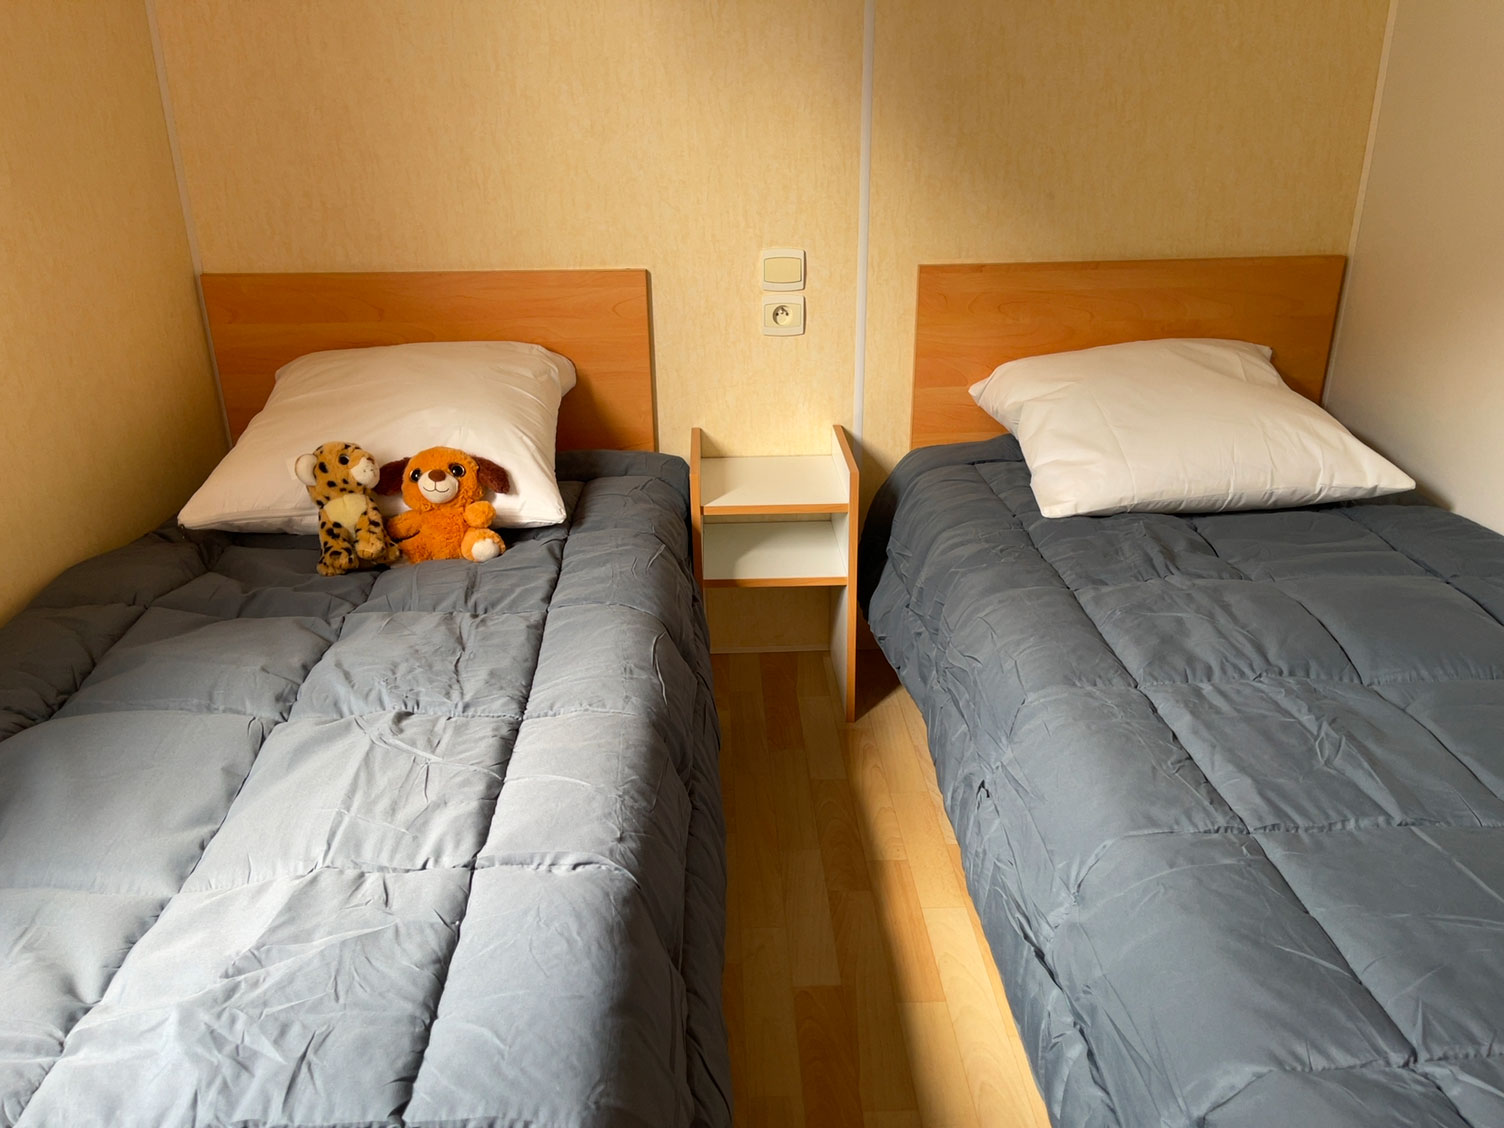 galerie-location-mobil-home-6-8-personnes-evasion-chambre-enfant-bis-camping-moricq